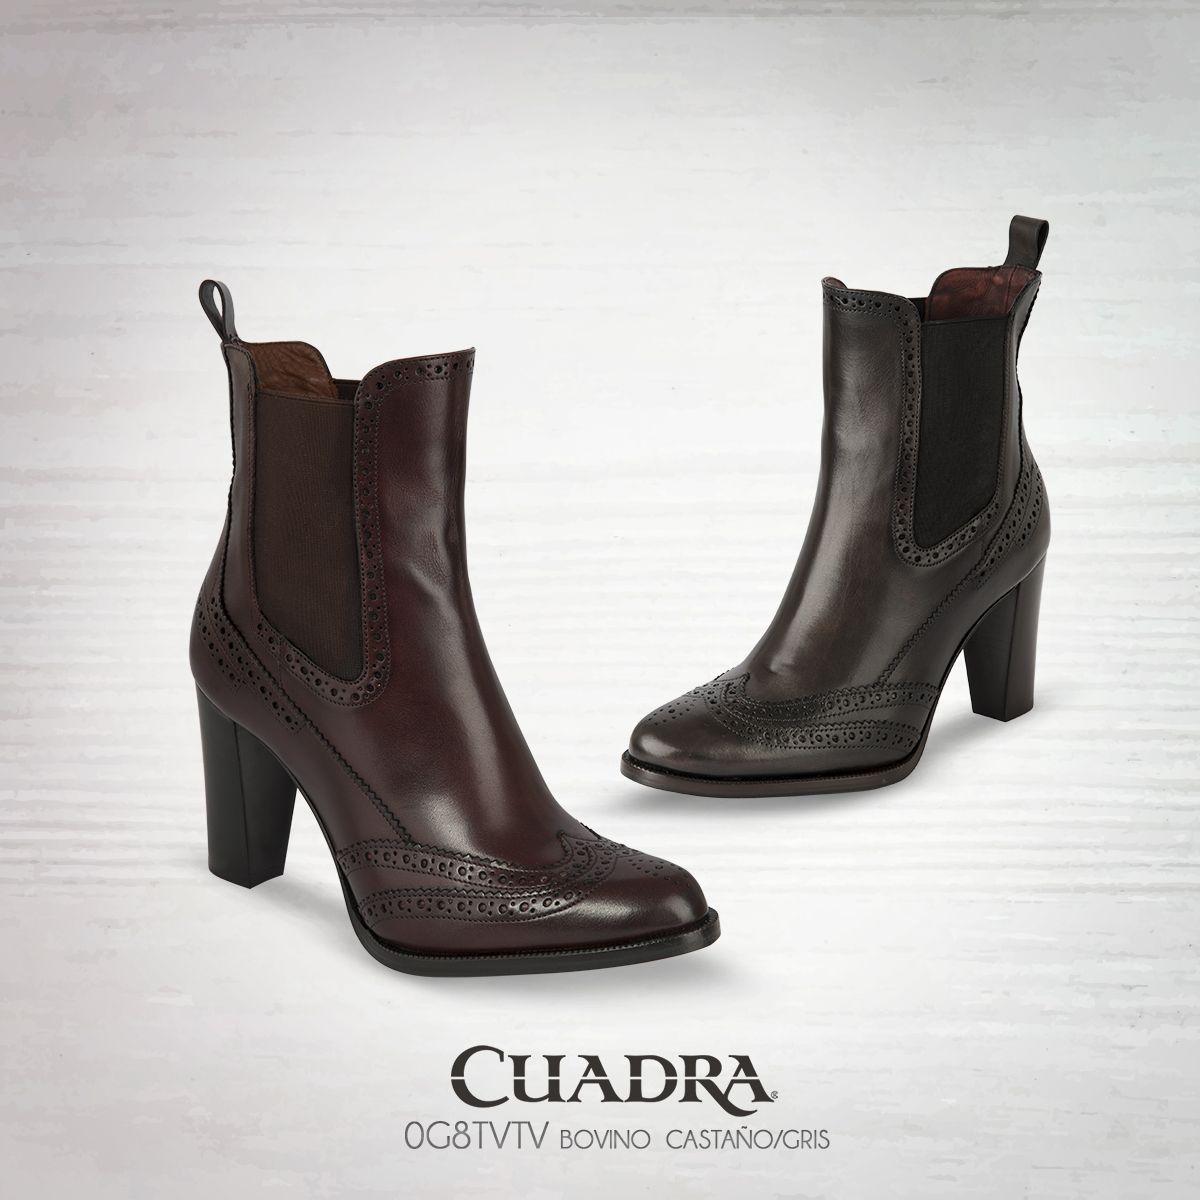 Un moderno diseño con estilo clásico.  boots leather botines dama 2016  2017 moda fashion streetstyle c33d44d932eb